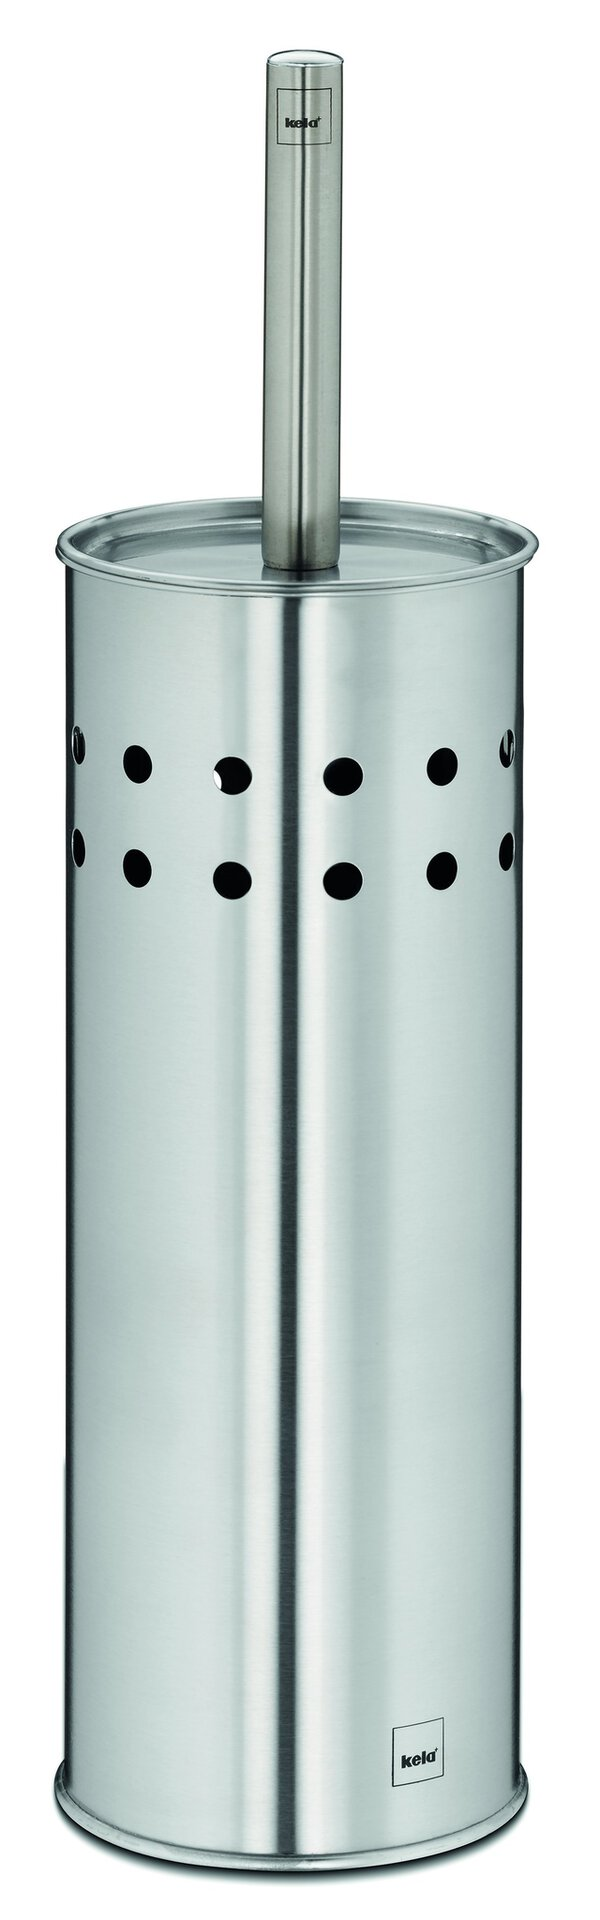 WC-Zubehör Bodo Kela Metall silber